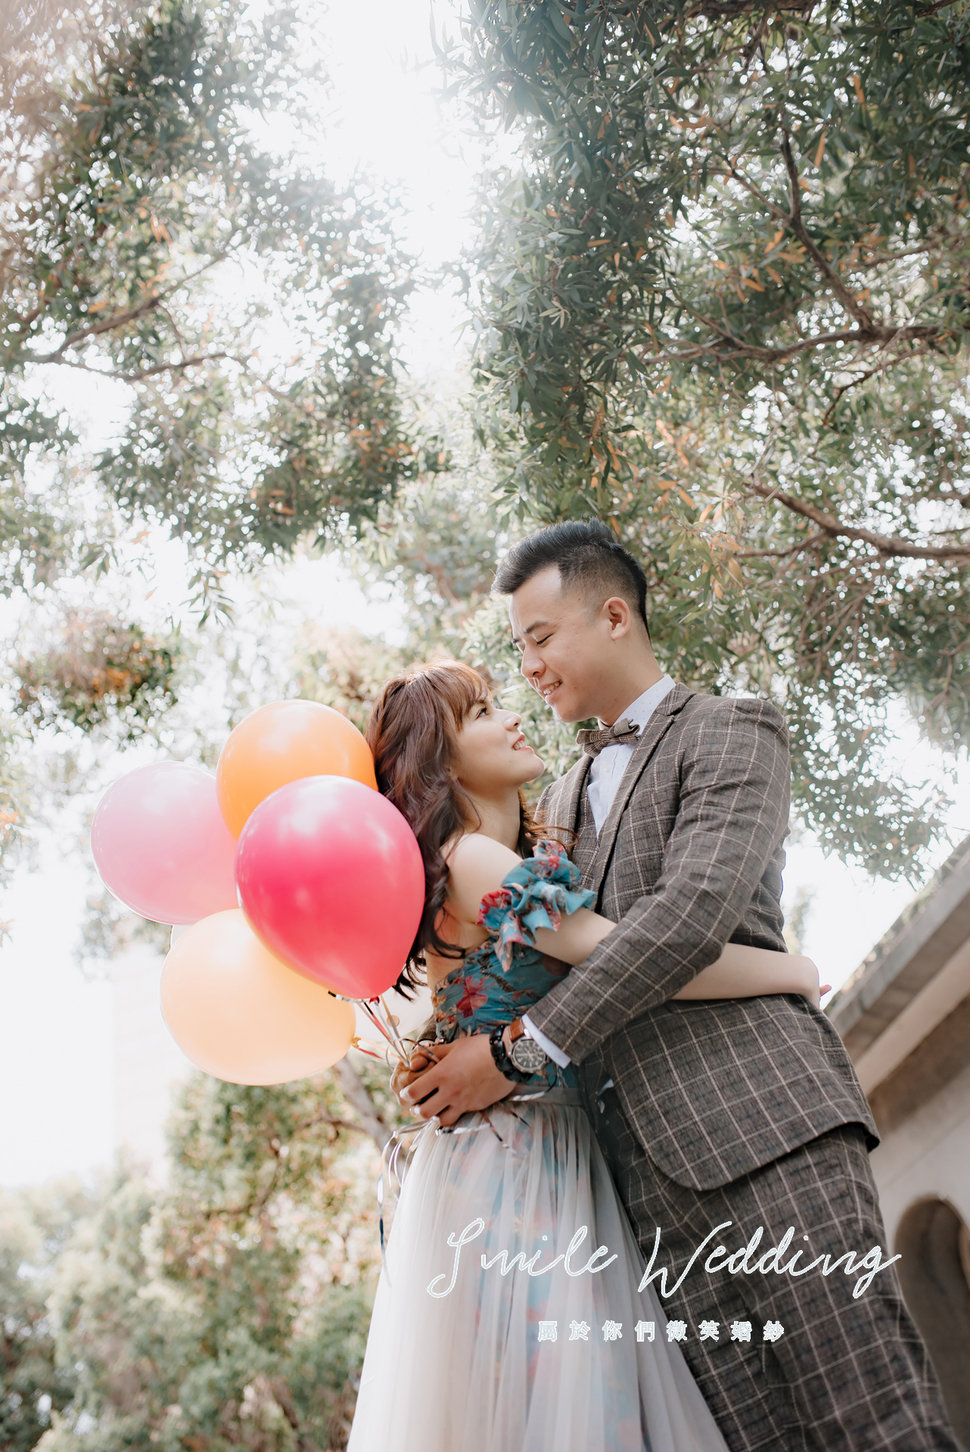 WEI_2690 - Smile wedding 微笑婚紗《結婚吧》